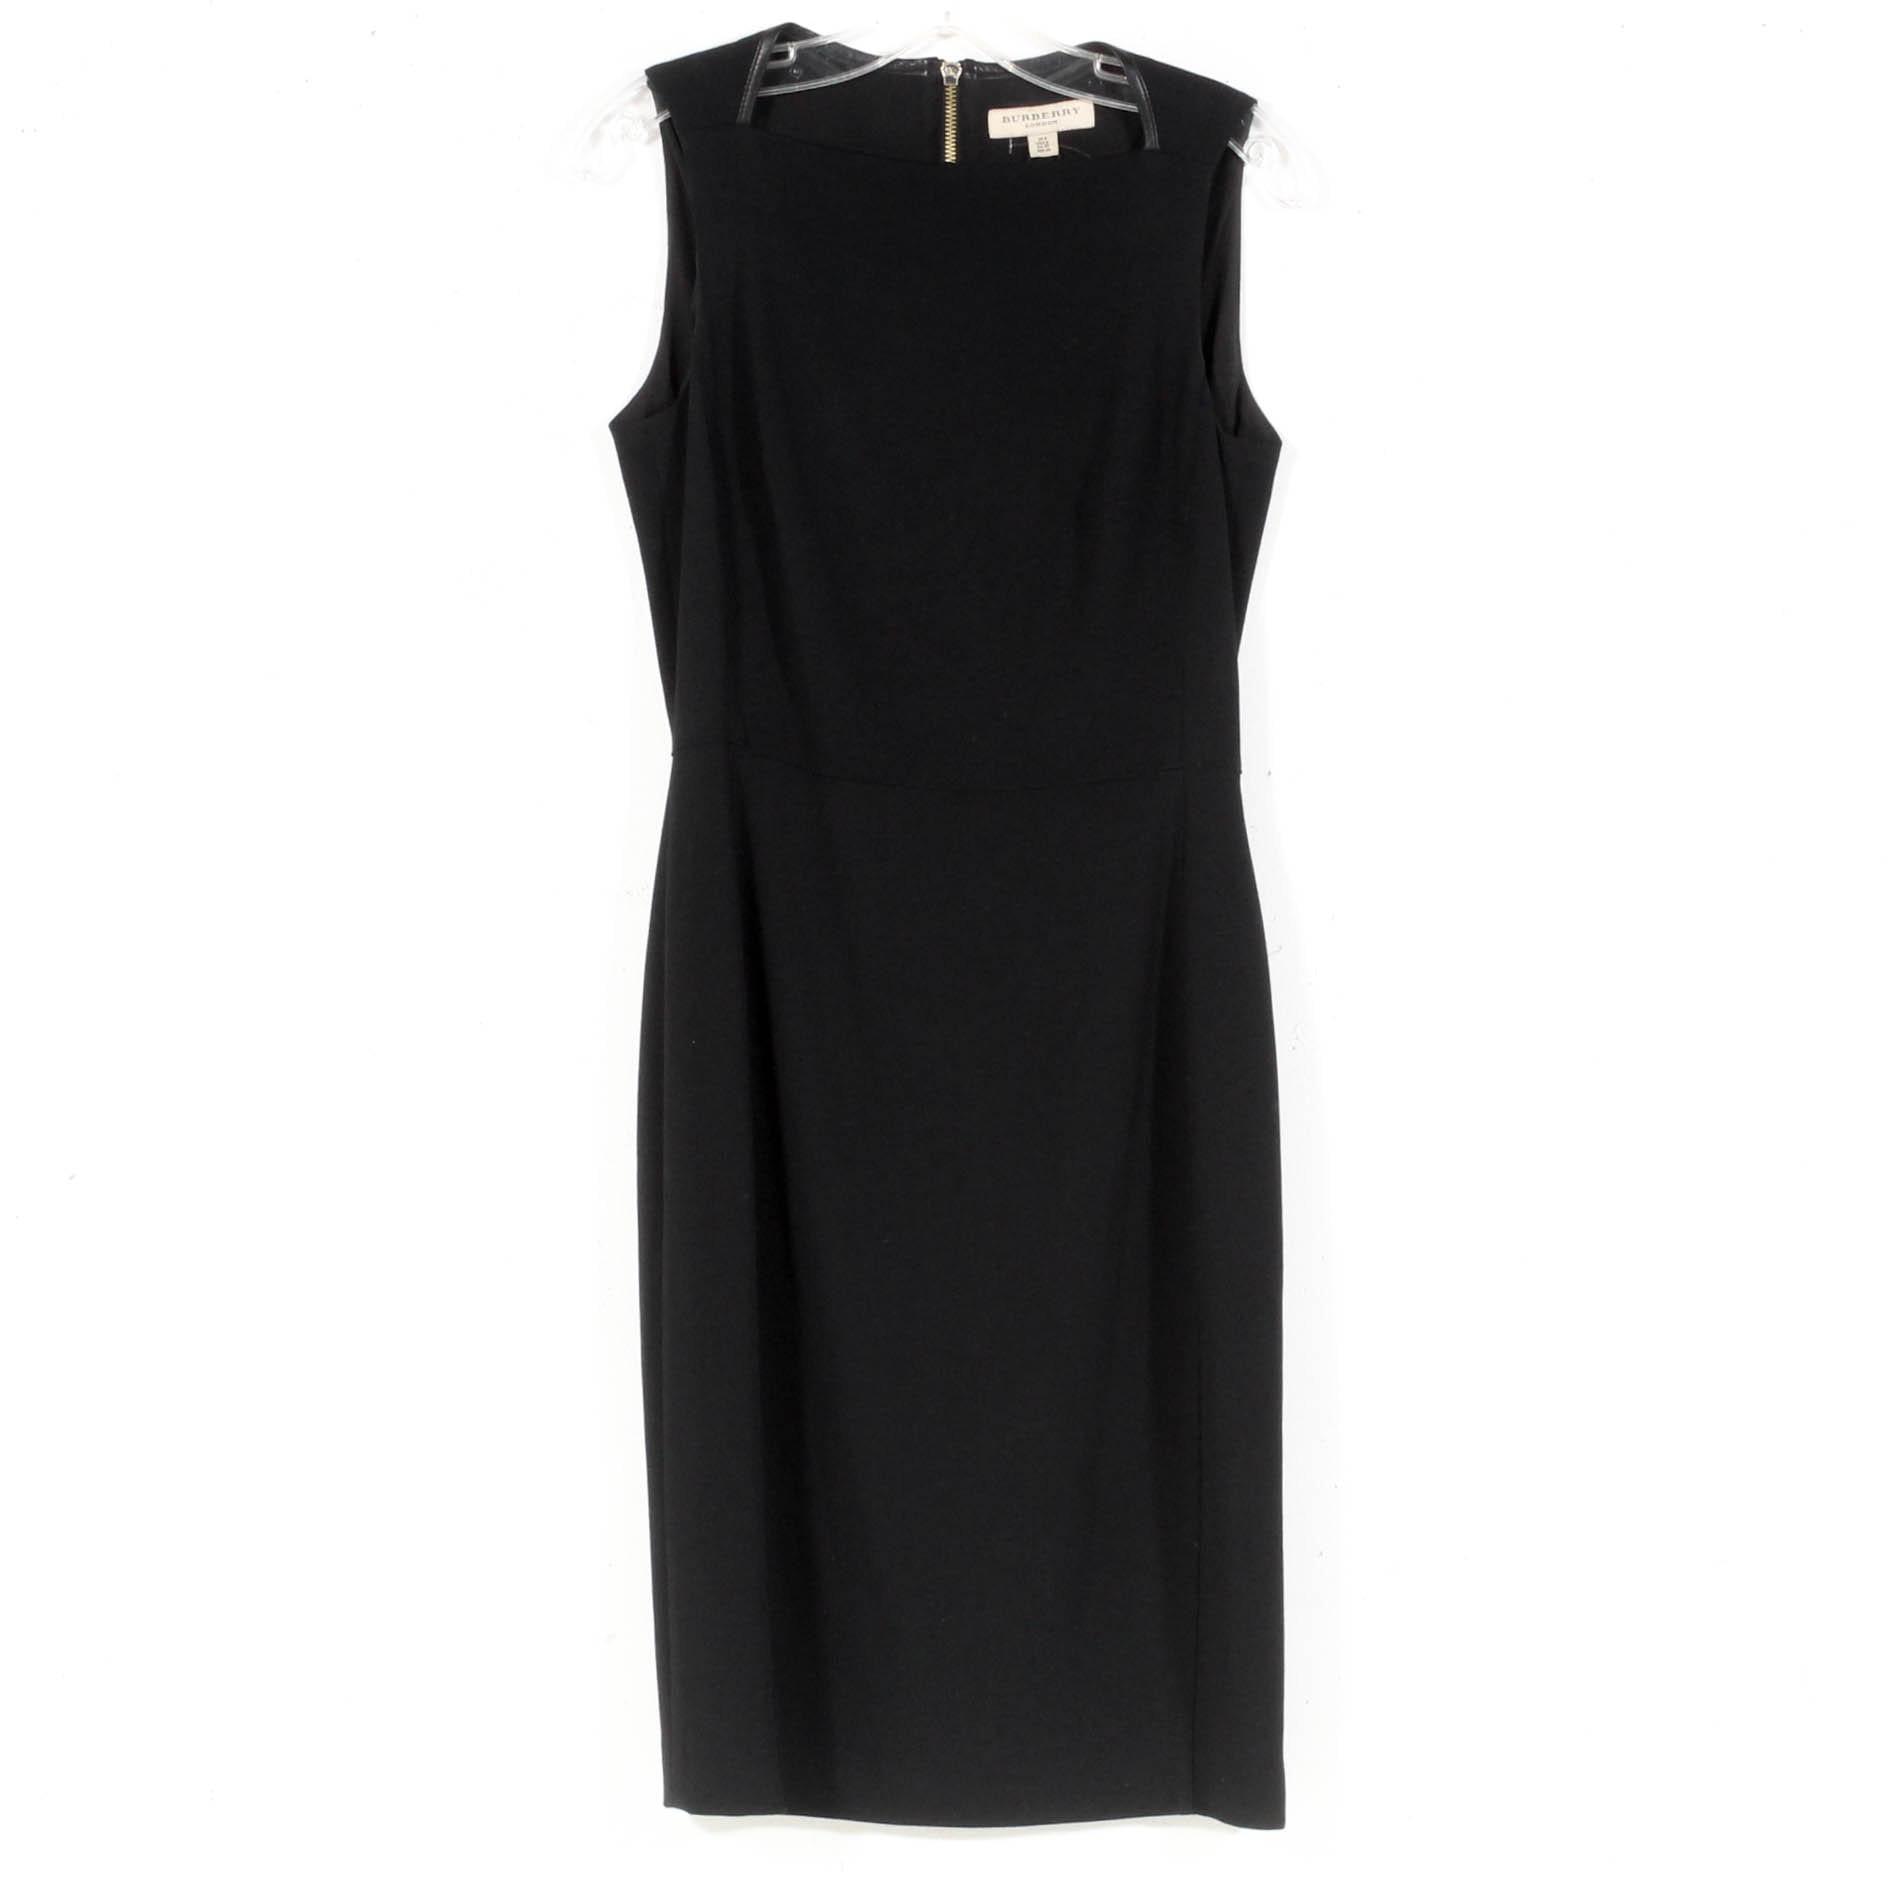 Burberry Sleeveless Black Dress